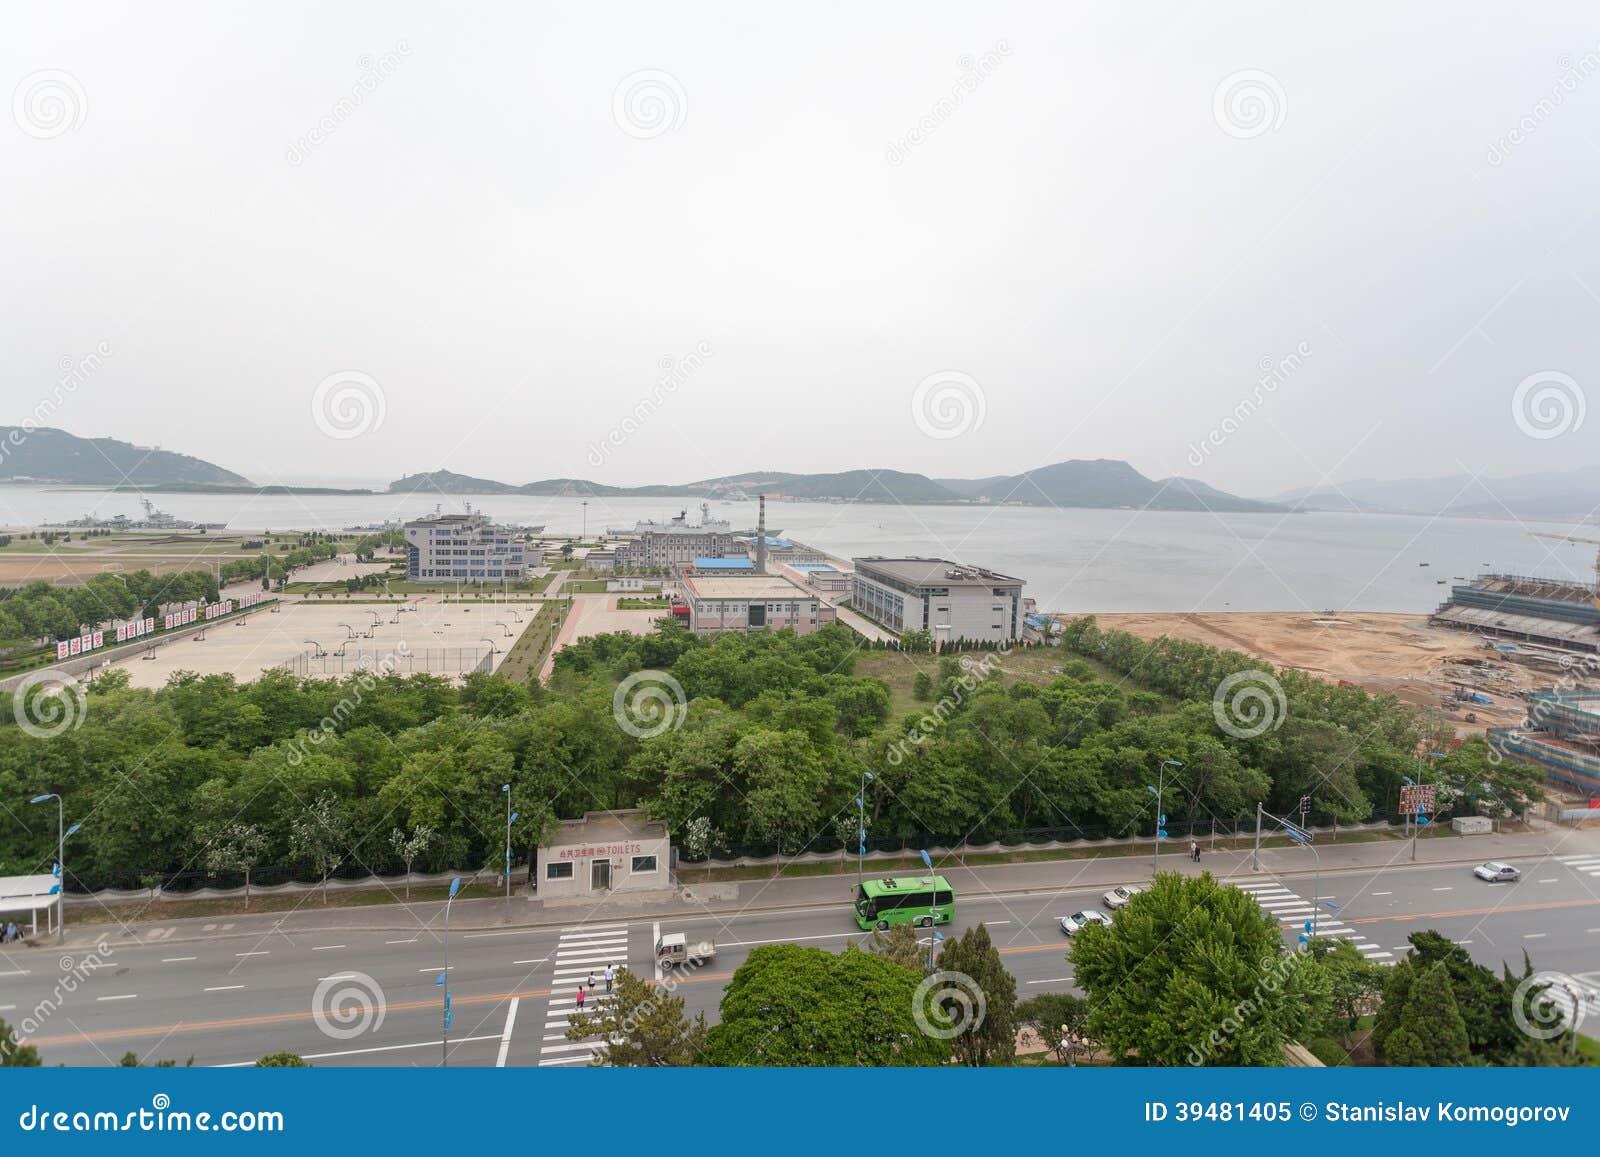 Port Arthur, or Lushun